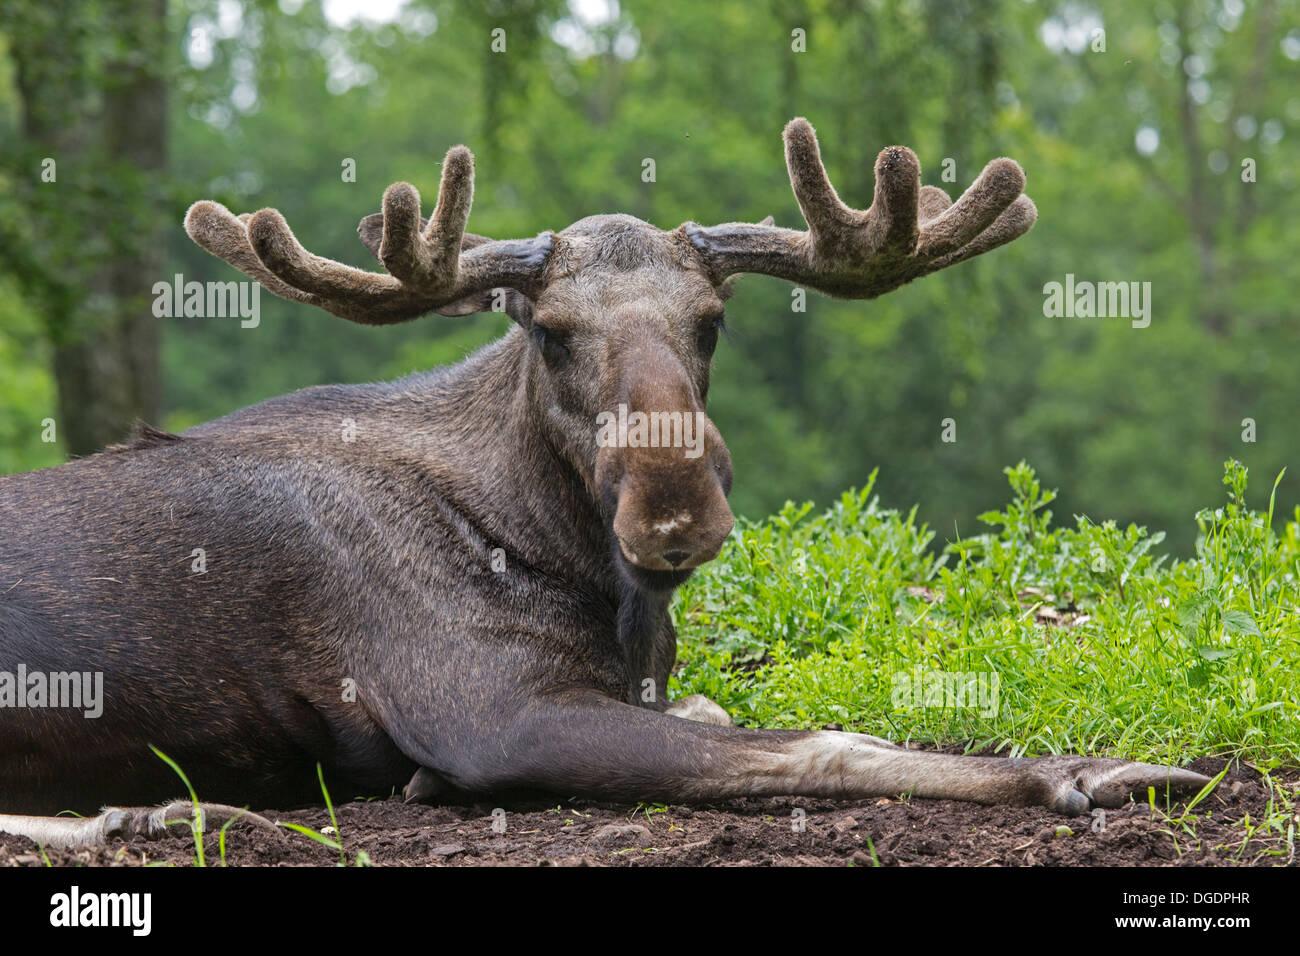 Moose | Zoo around The world